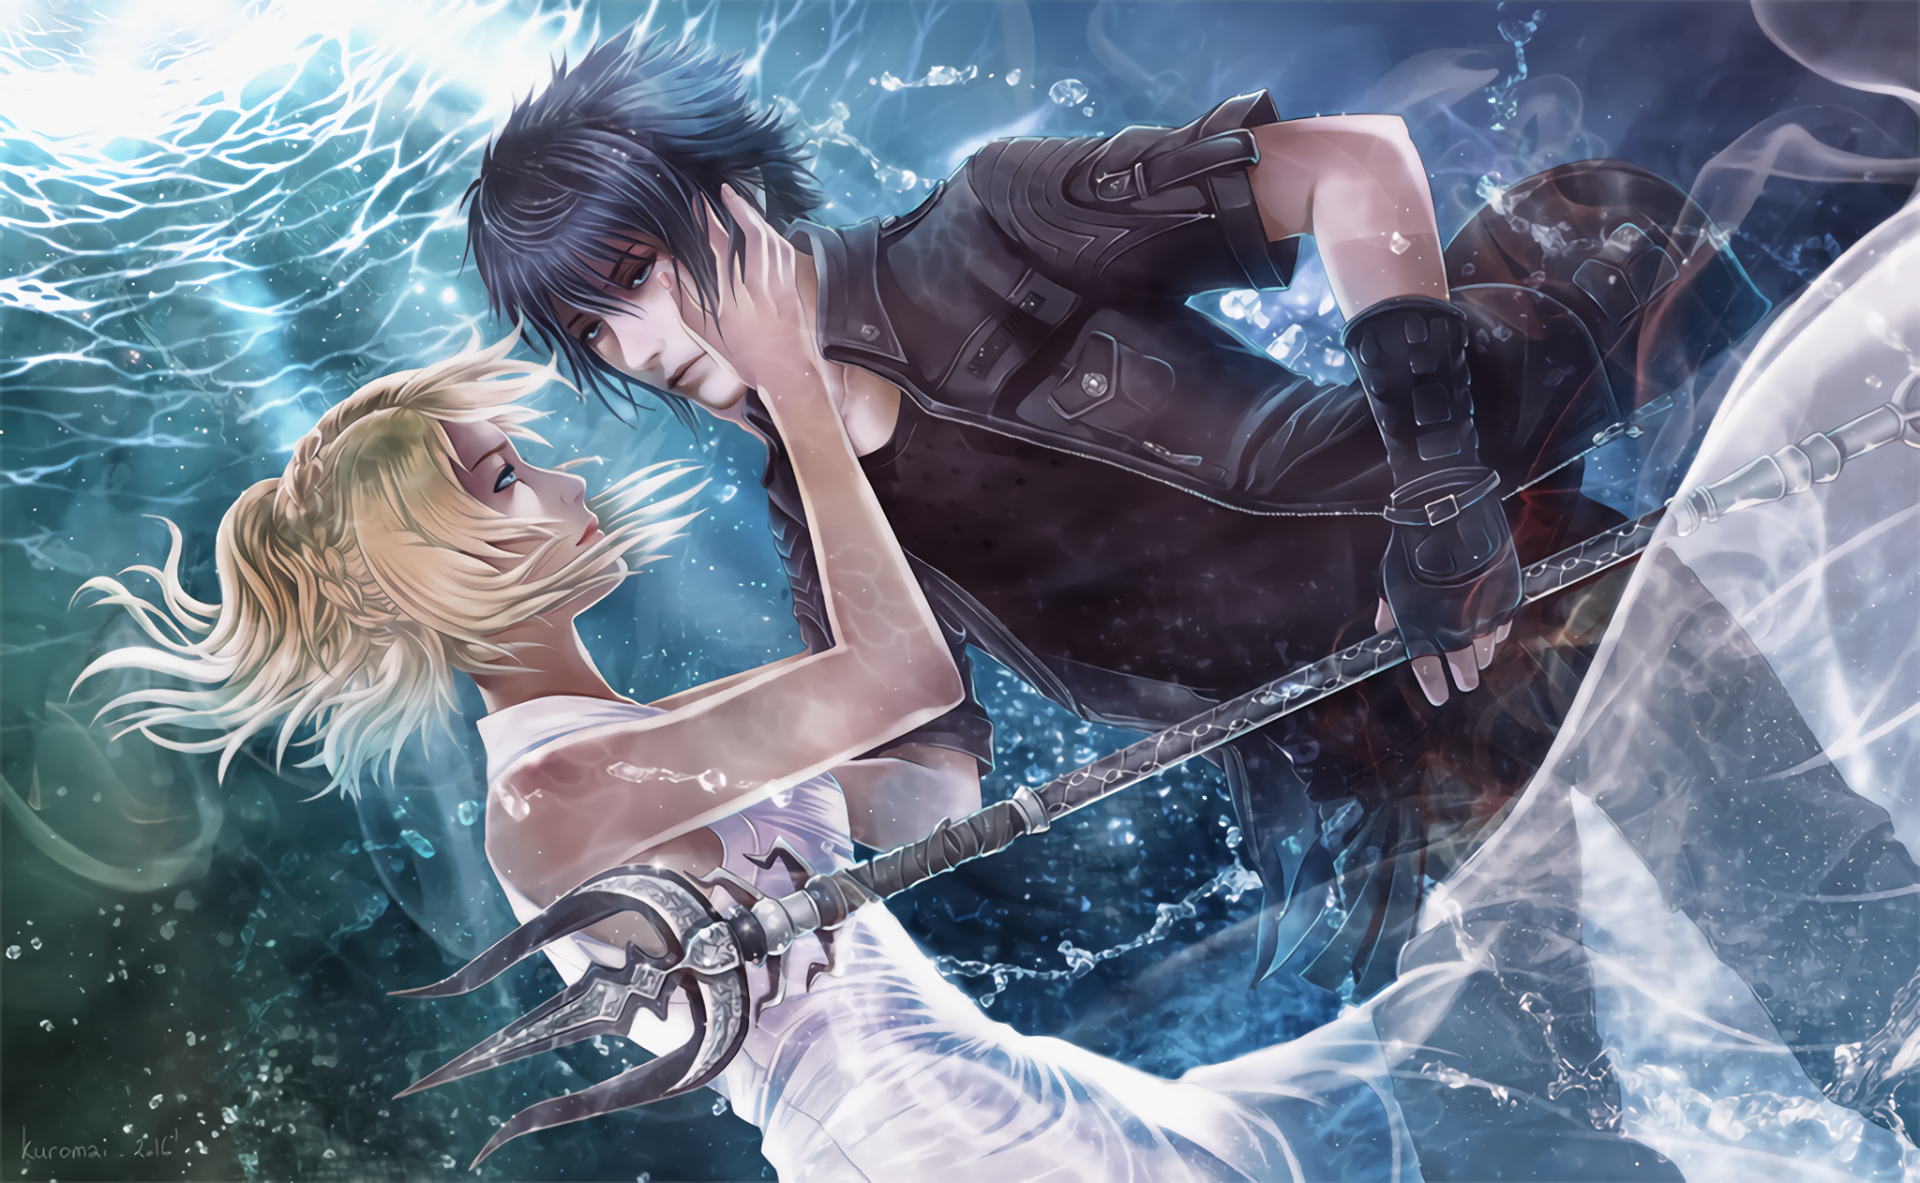 4k Noctis Lucis Caelum Final Fantasy Xv Hd Games 4k: Final Fantasy XV HD Wallpaper